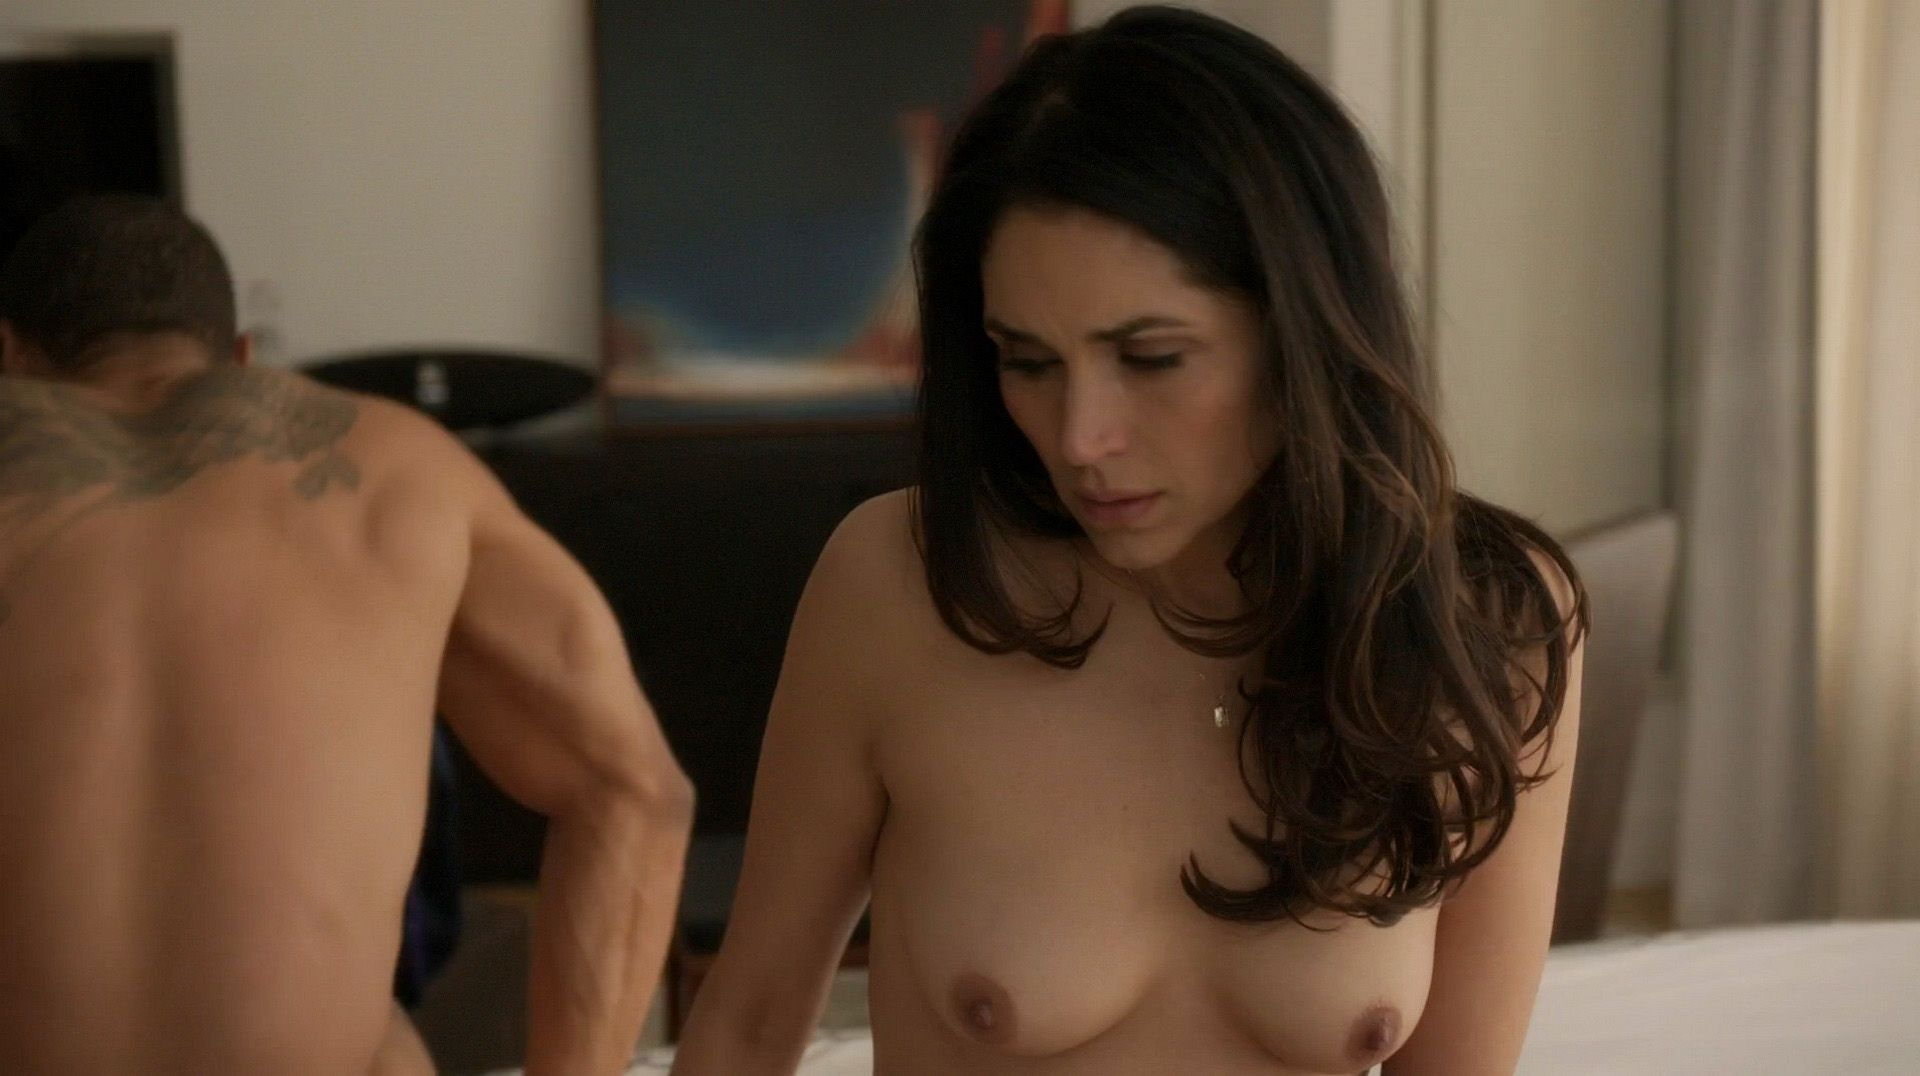 Angelique Pettyjohn Topless jessica loren nude - big boob and tight ass